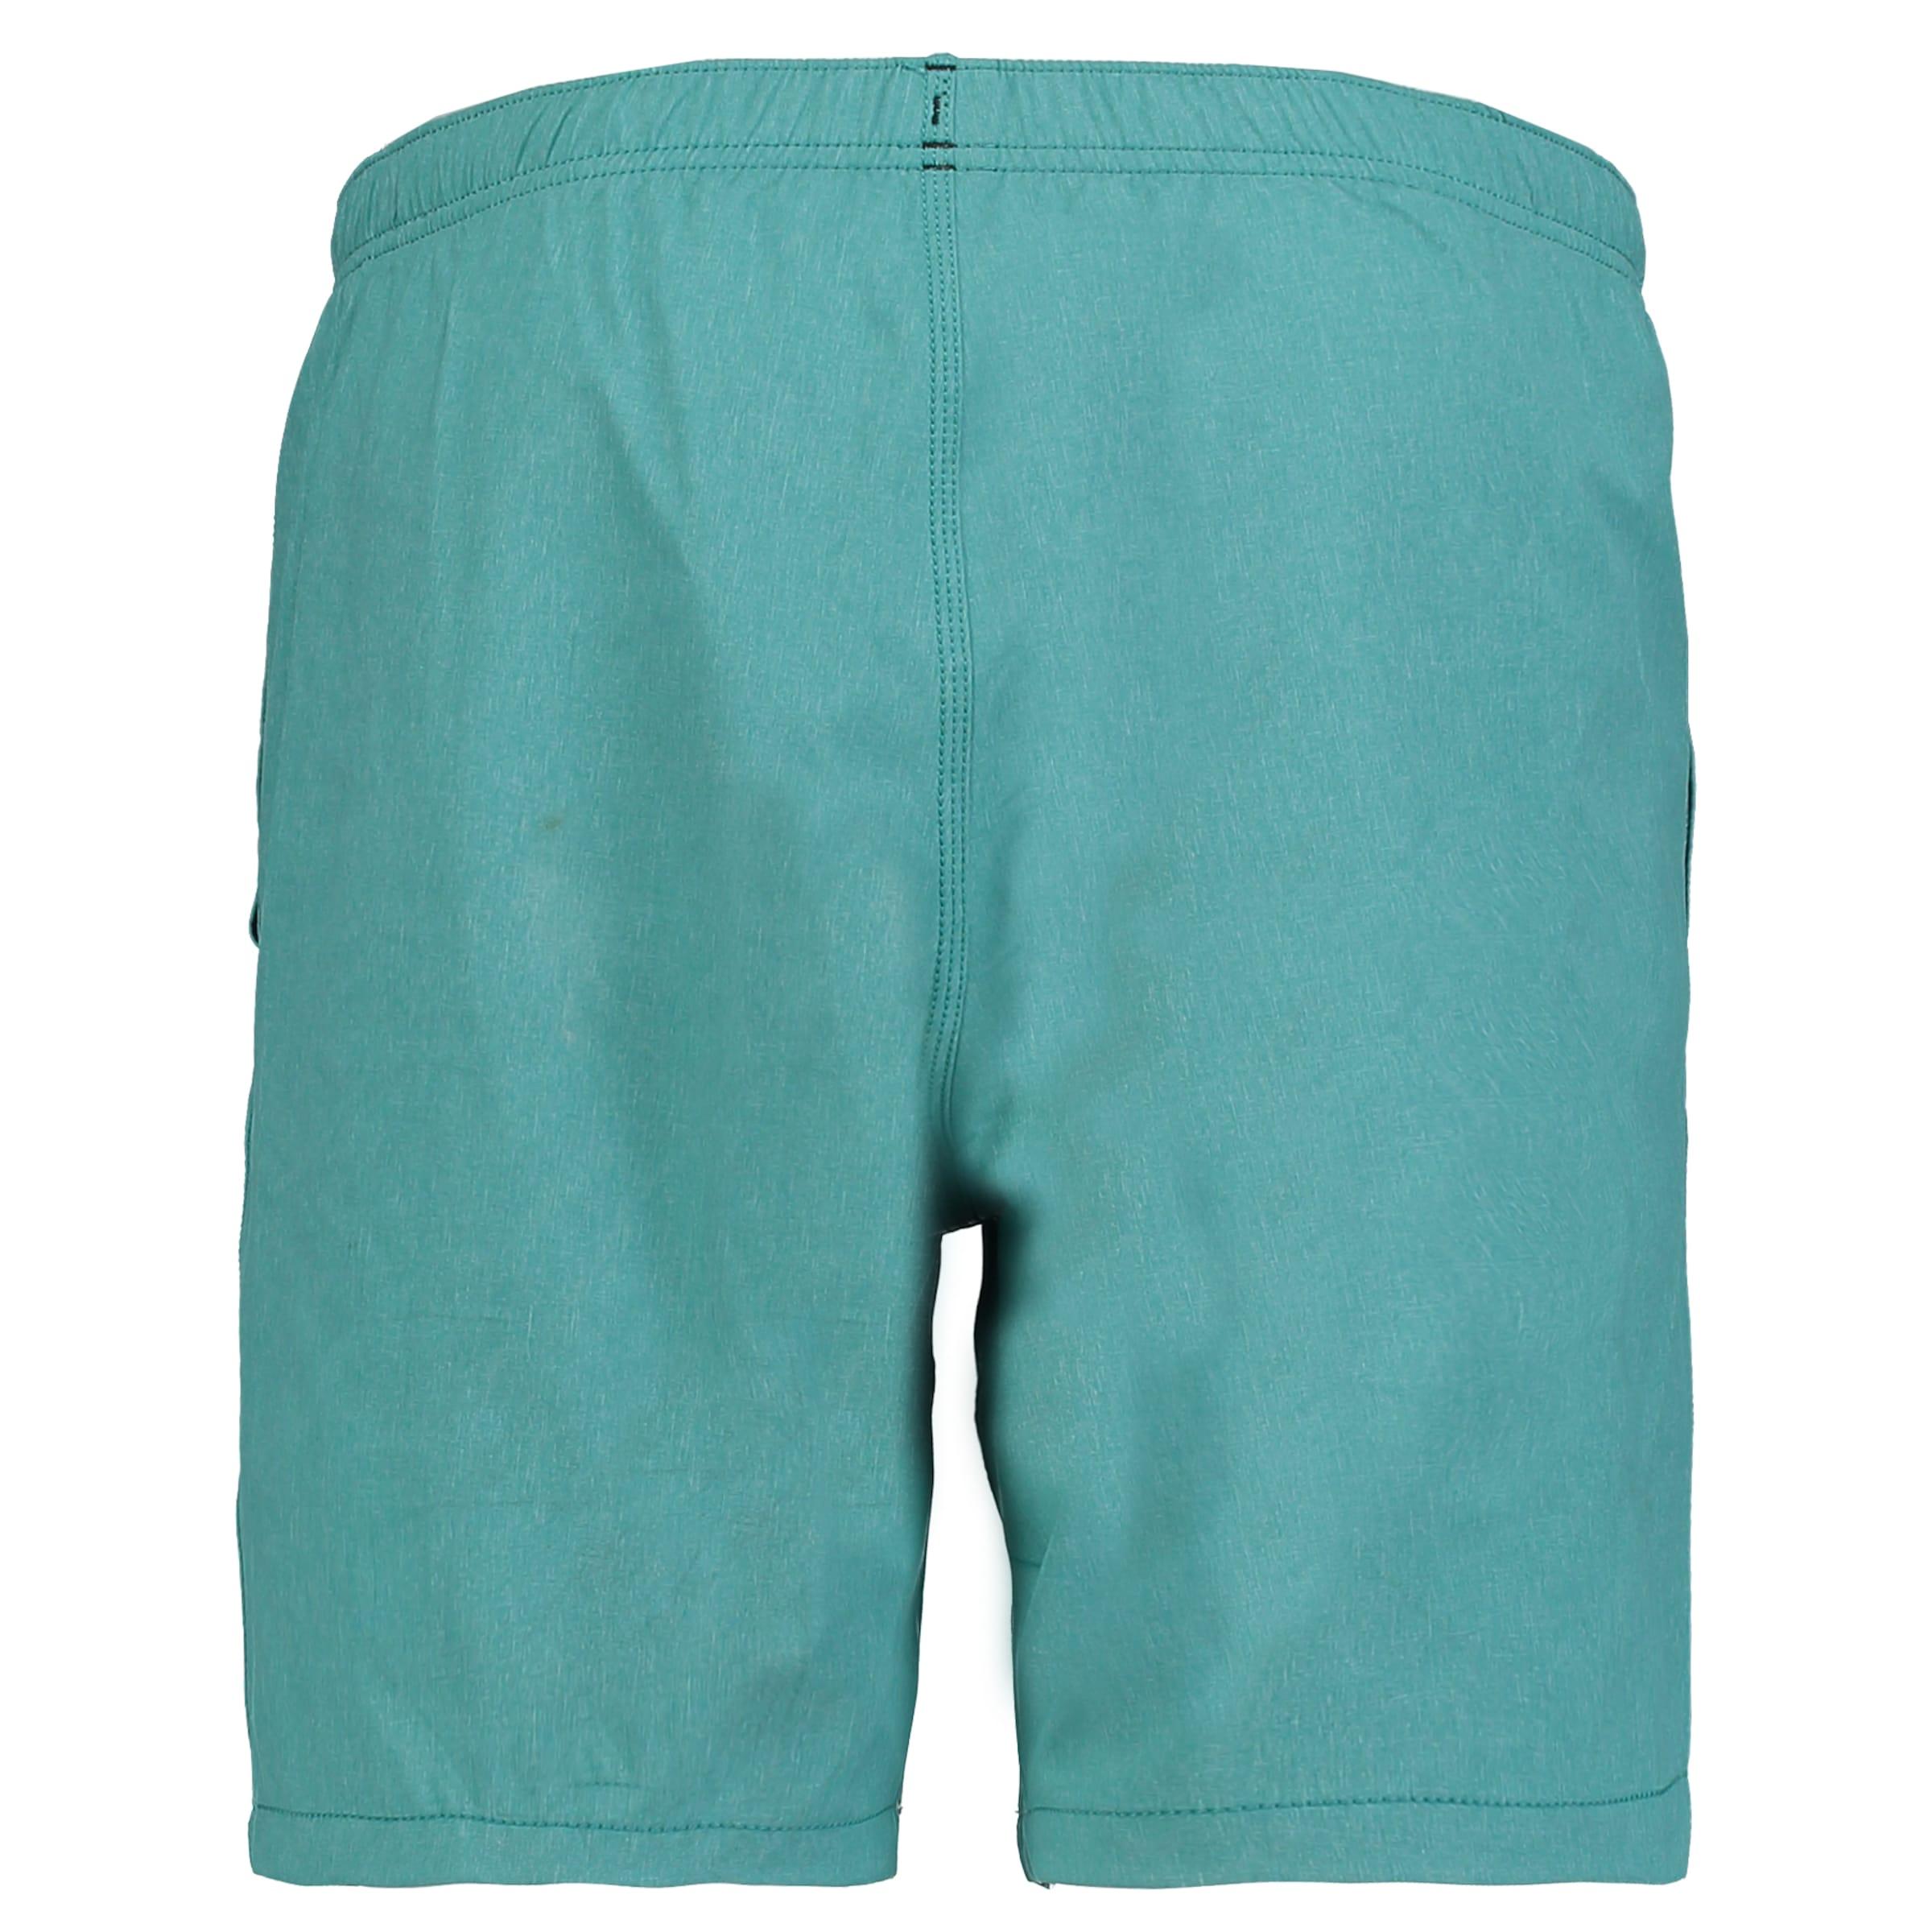 Verkauf Geschäft O'NEILL Shorts 'PM All Day Hybrid' Online 100% Garantiert Erkunden Verkauf Online Billig 100% Garantiert SXCbAazI